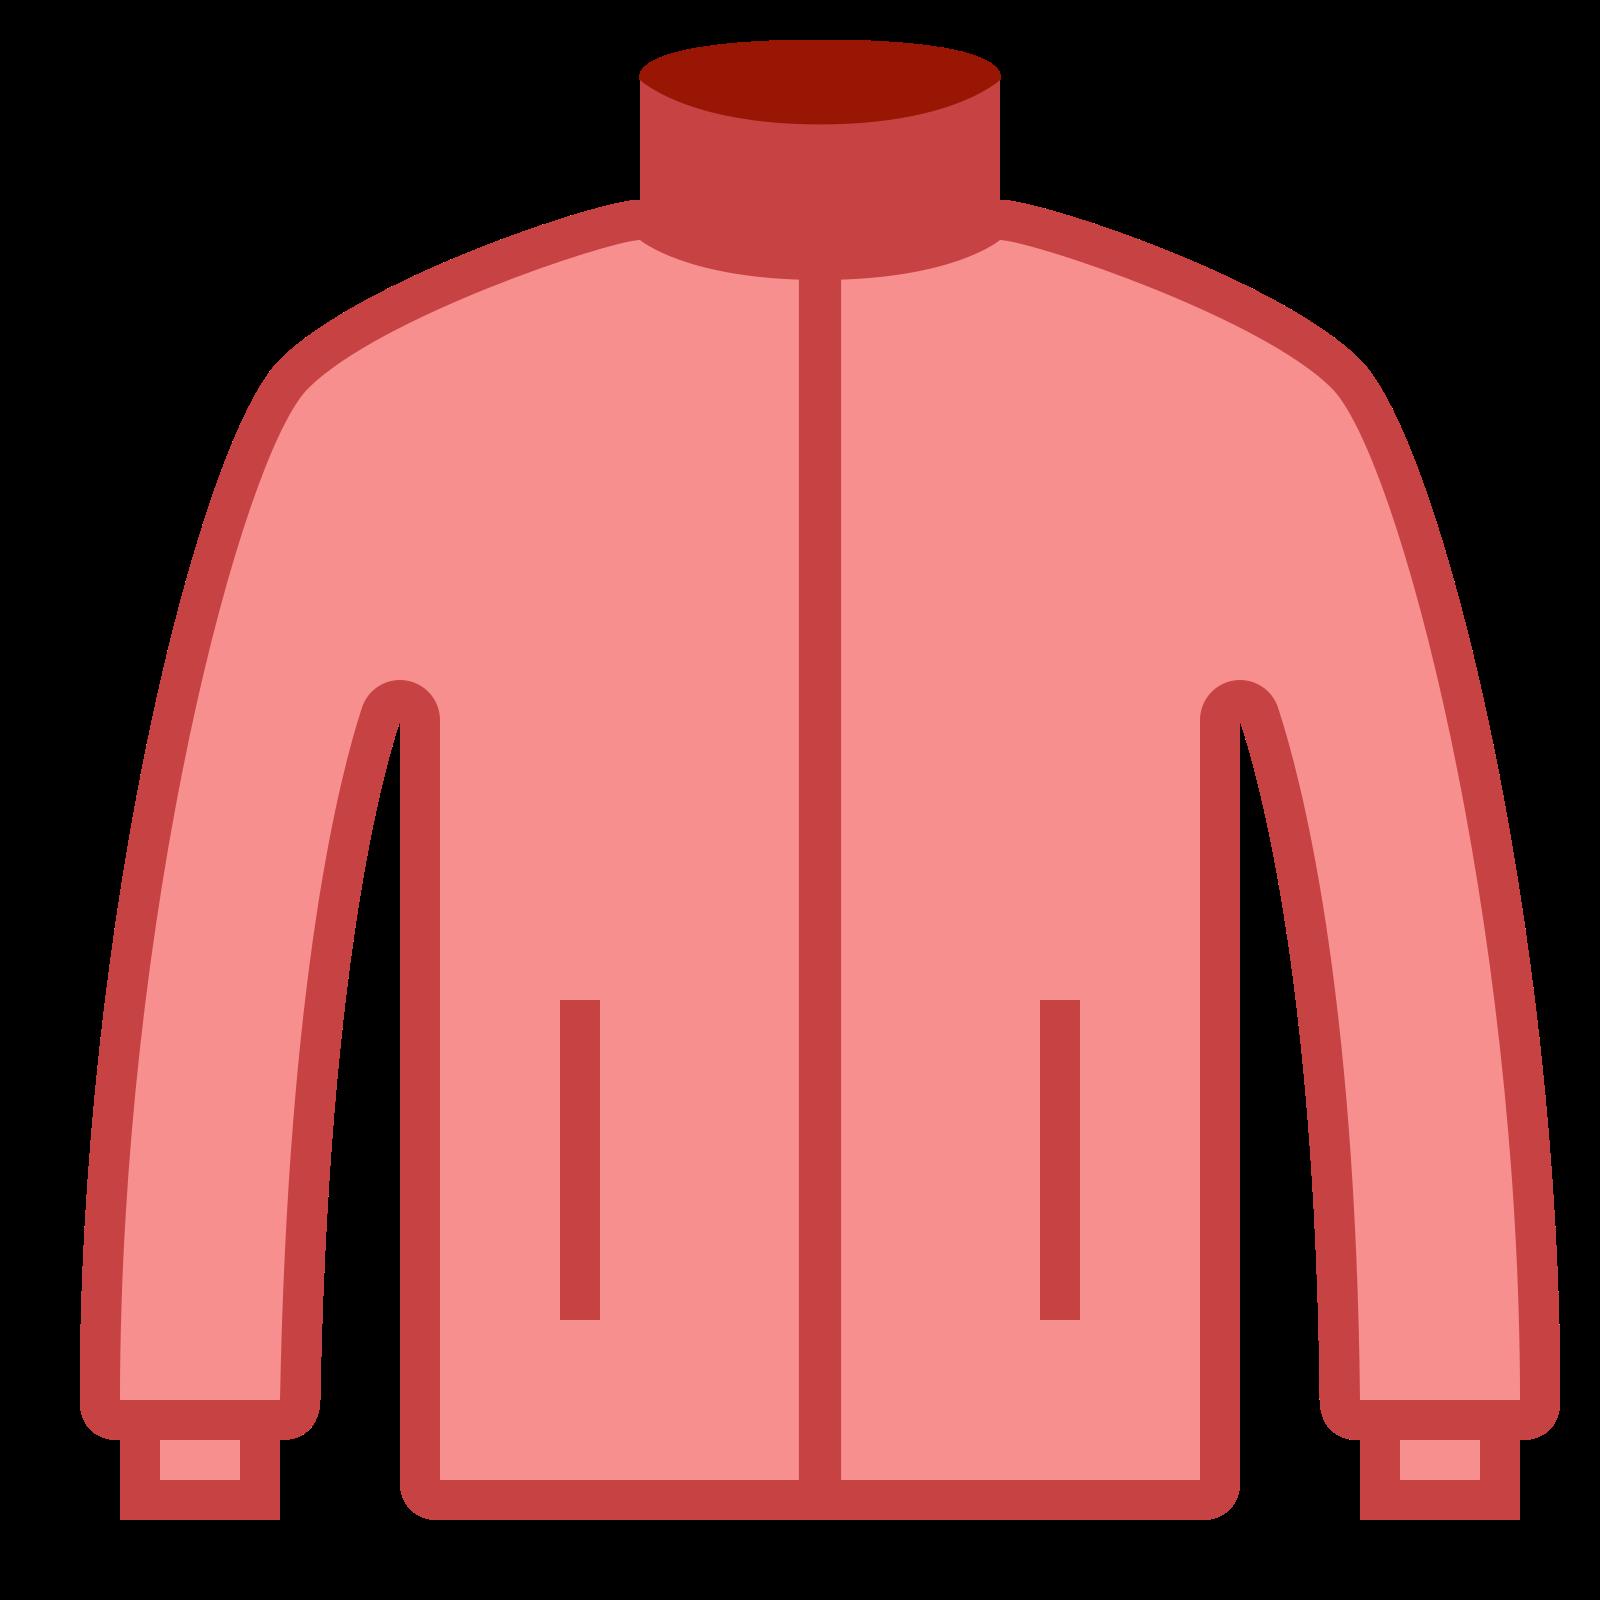 Kurtka icon